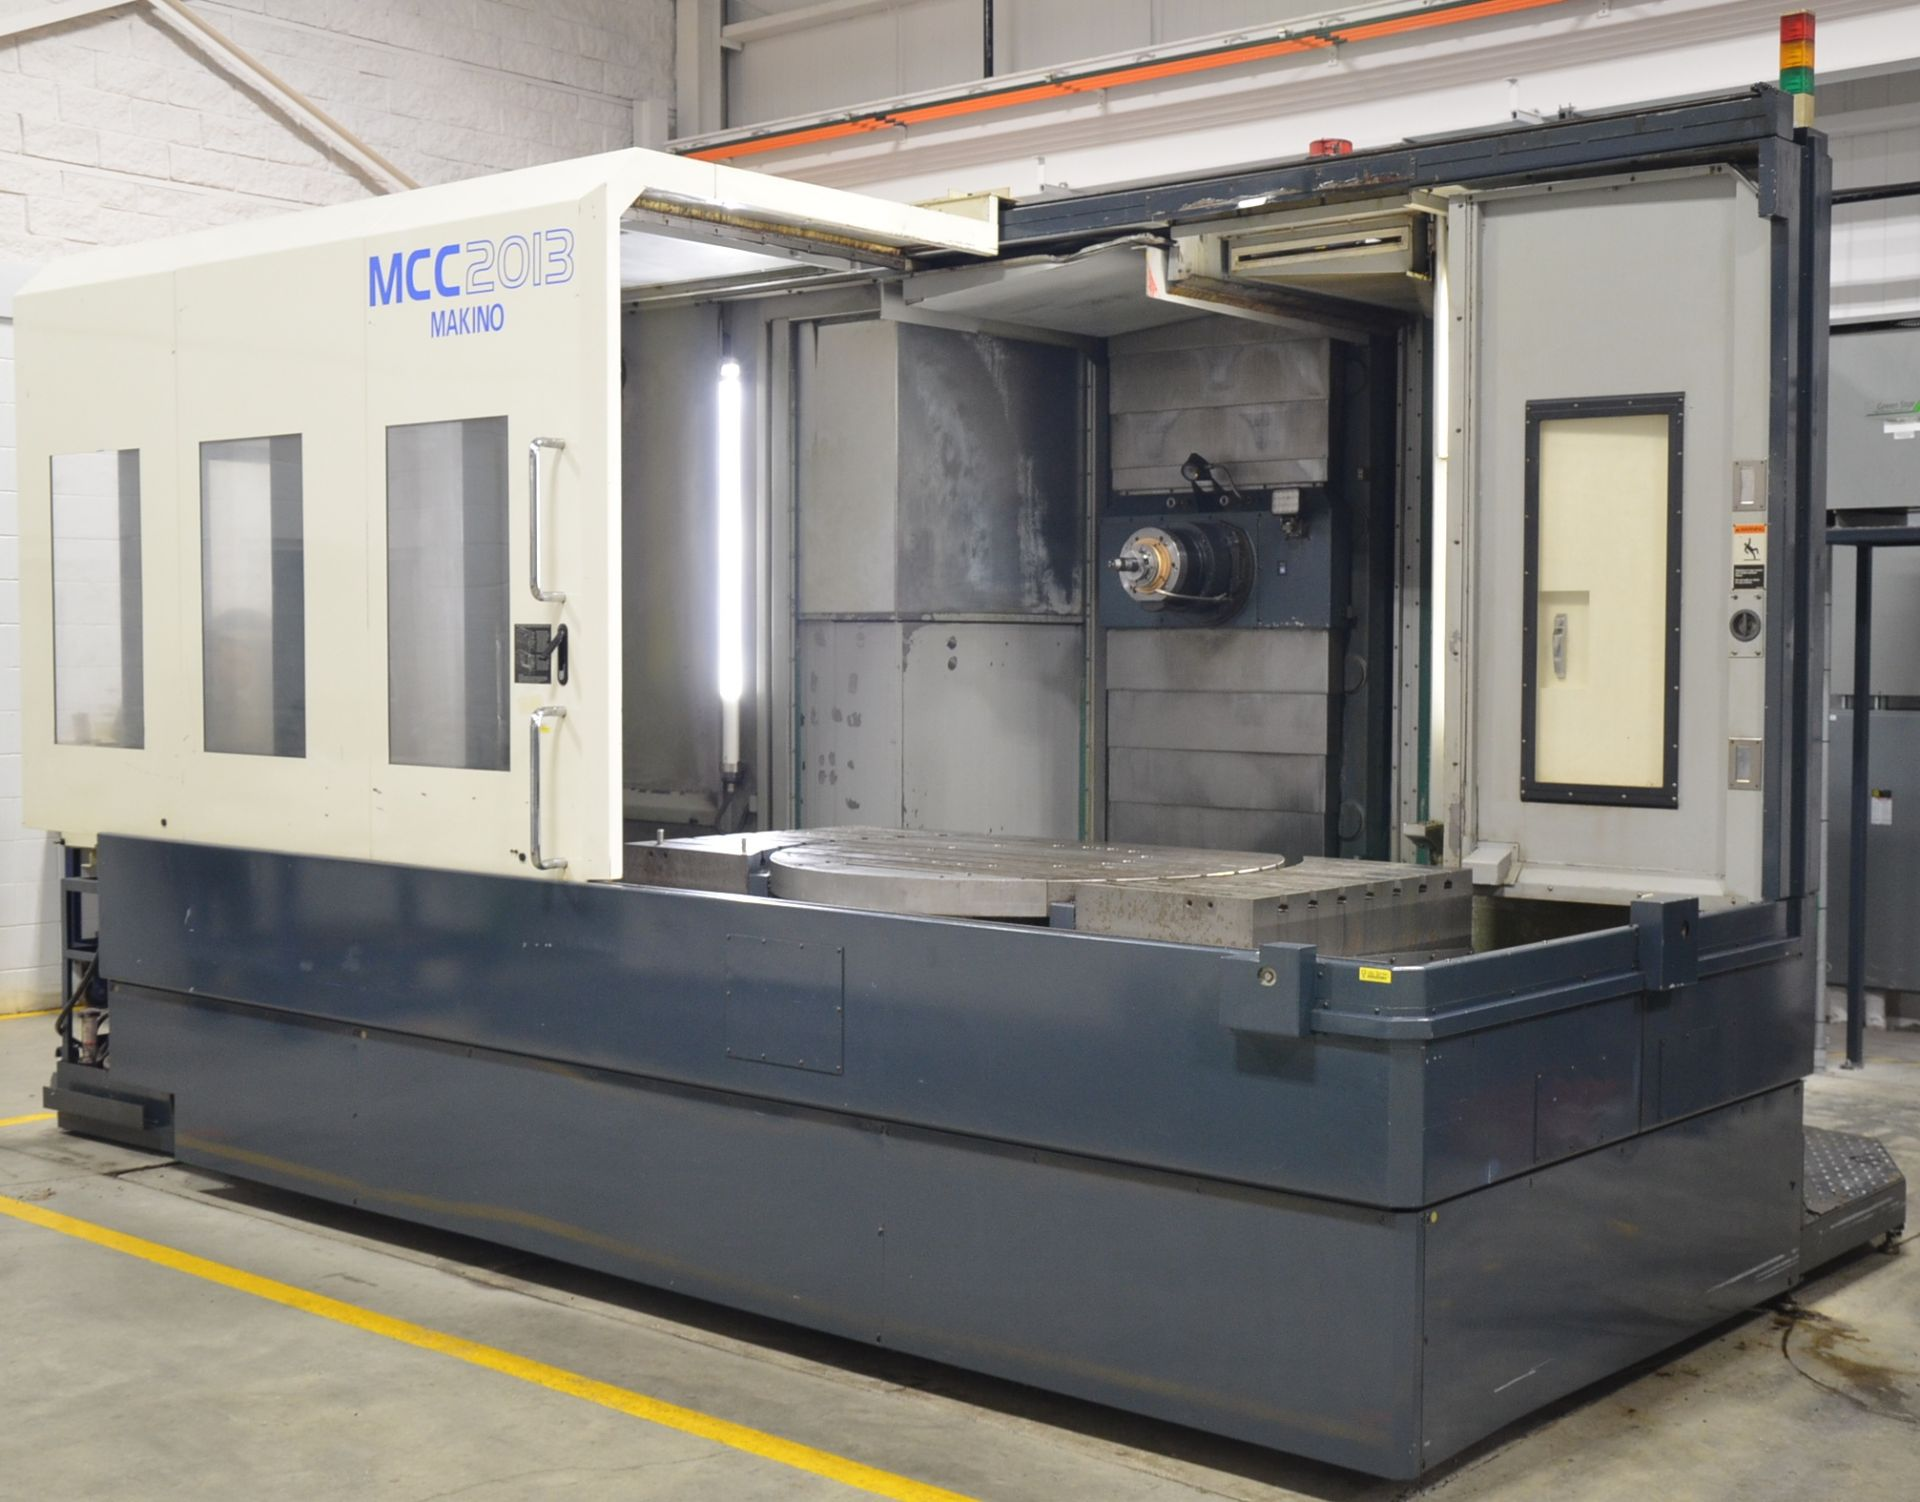 MAKINO (2008) MCC2013 4-AXIS HORIZONTAL MACHINING CENTER WITH MAKINO PROFESSIONAL 5 CNC CONTROL,